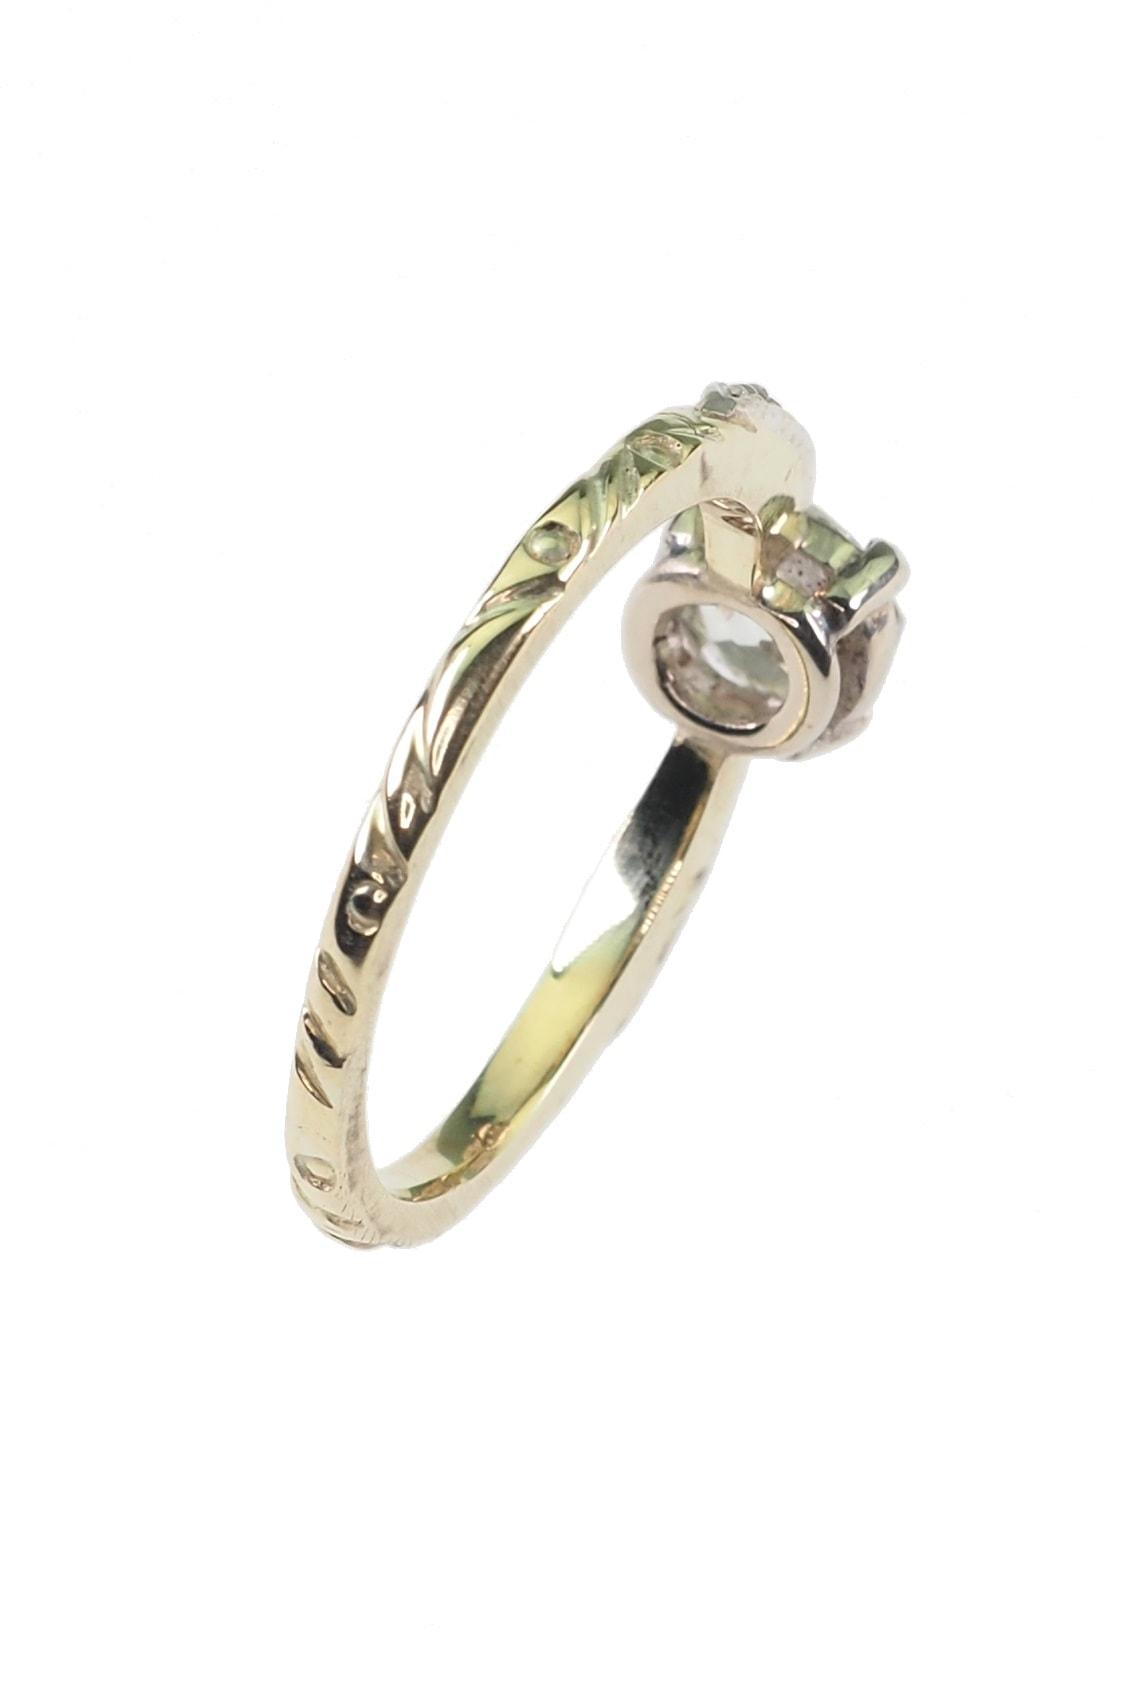 antike-Verlobungsringe-kaufen-2707b